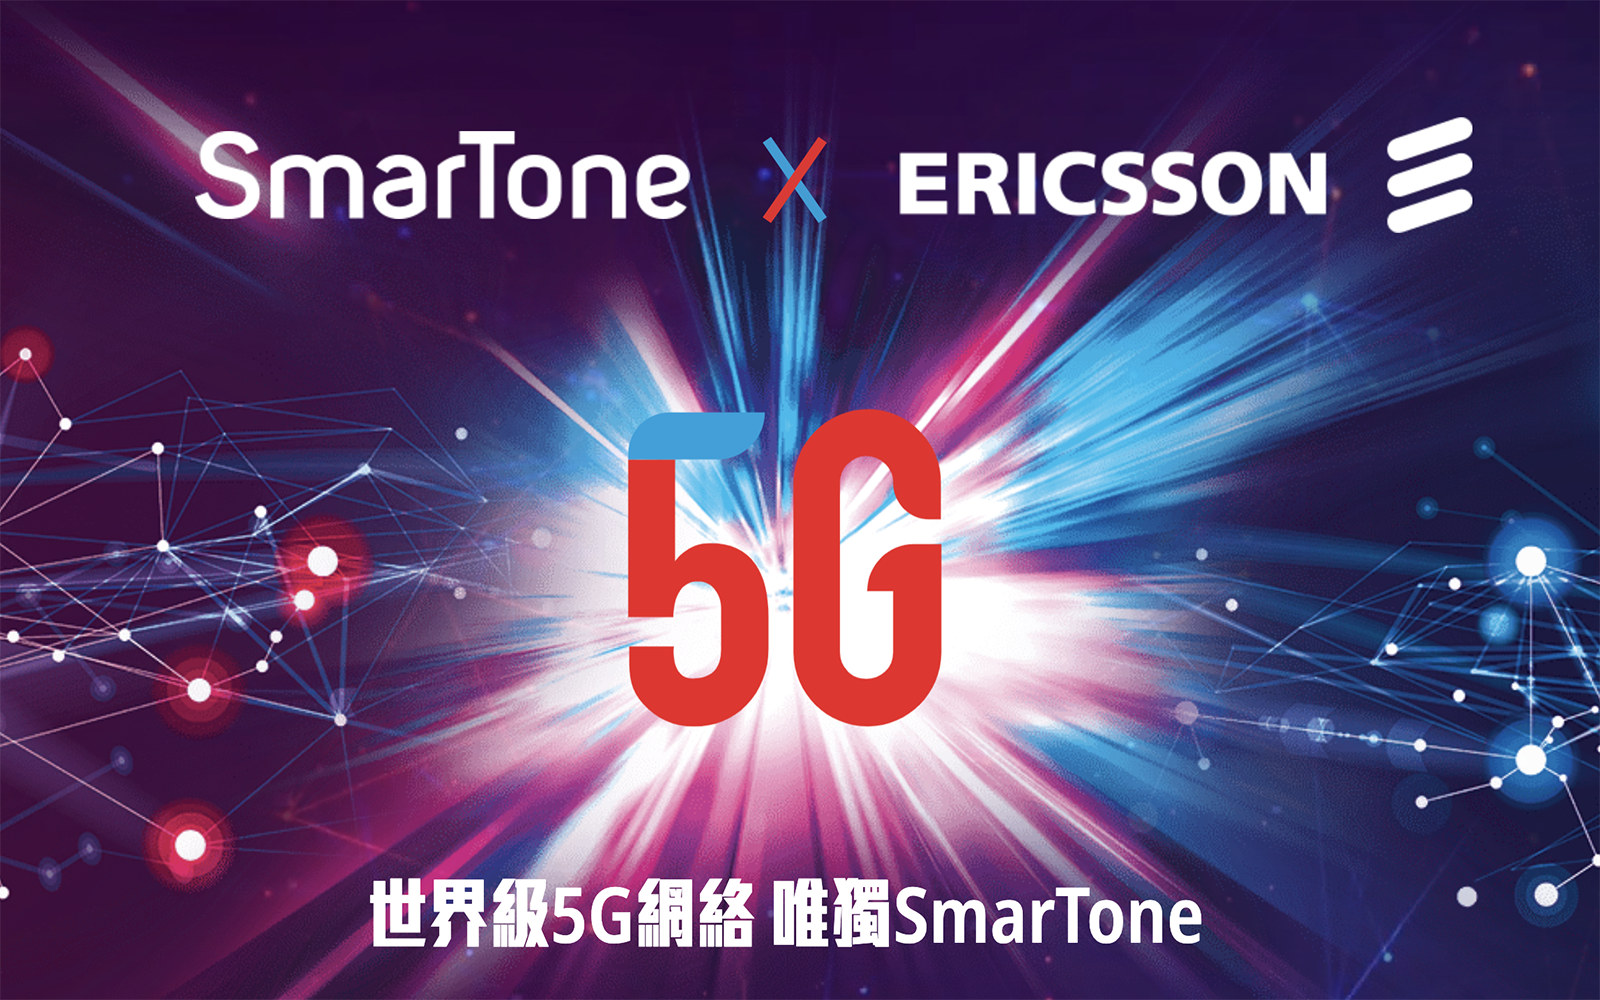 SmarTone 5G HK